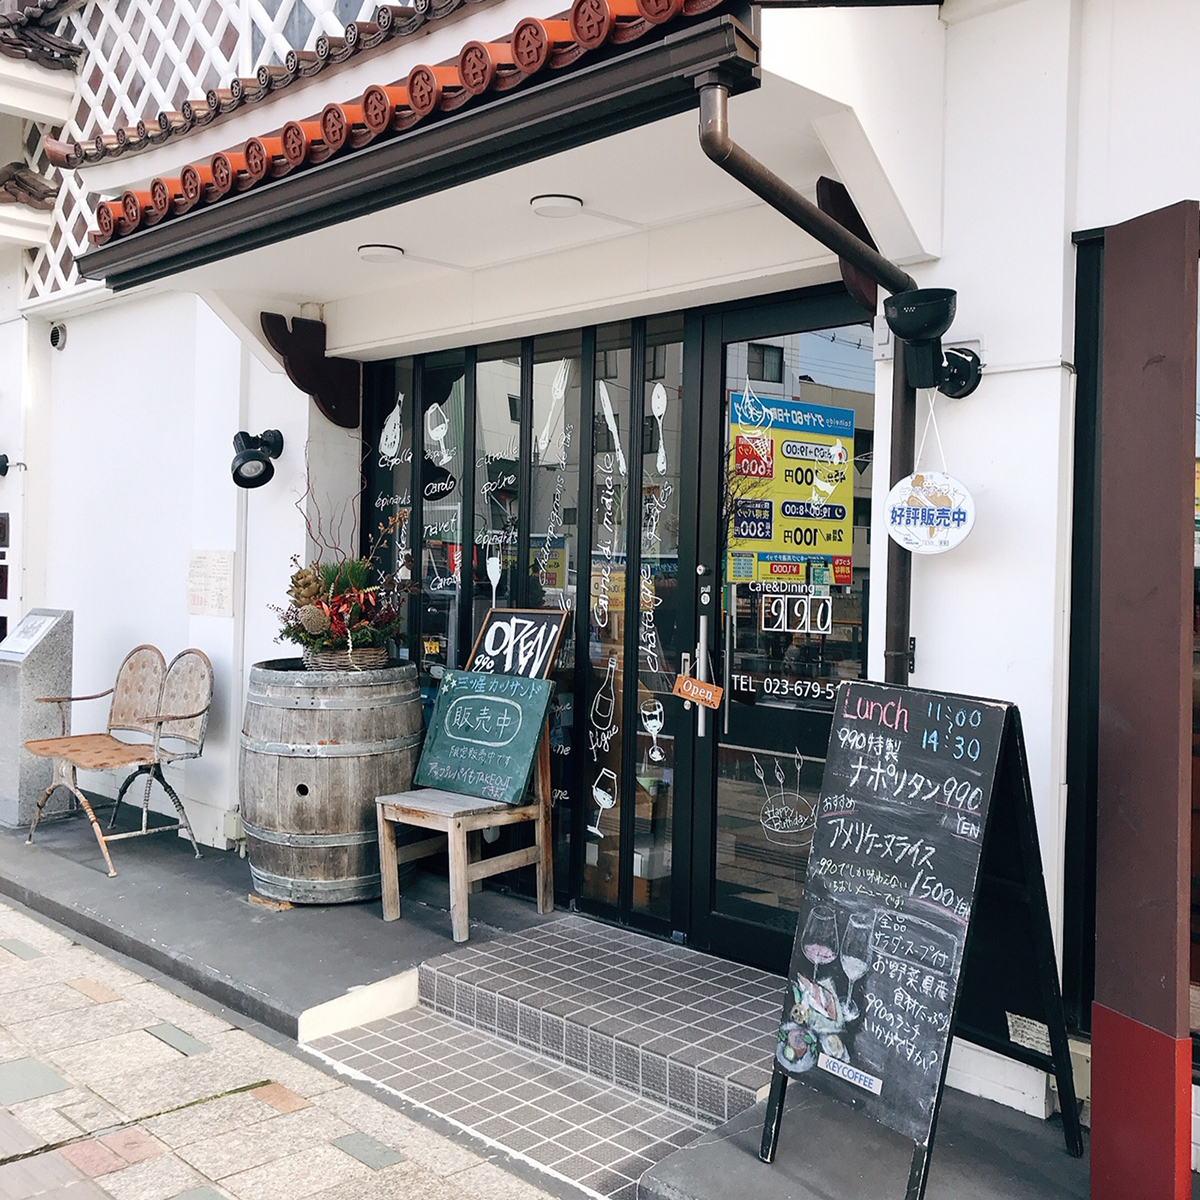 Cafe&Dinig「990」(山形まるごと館 紅の蔵)